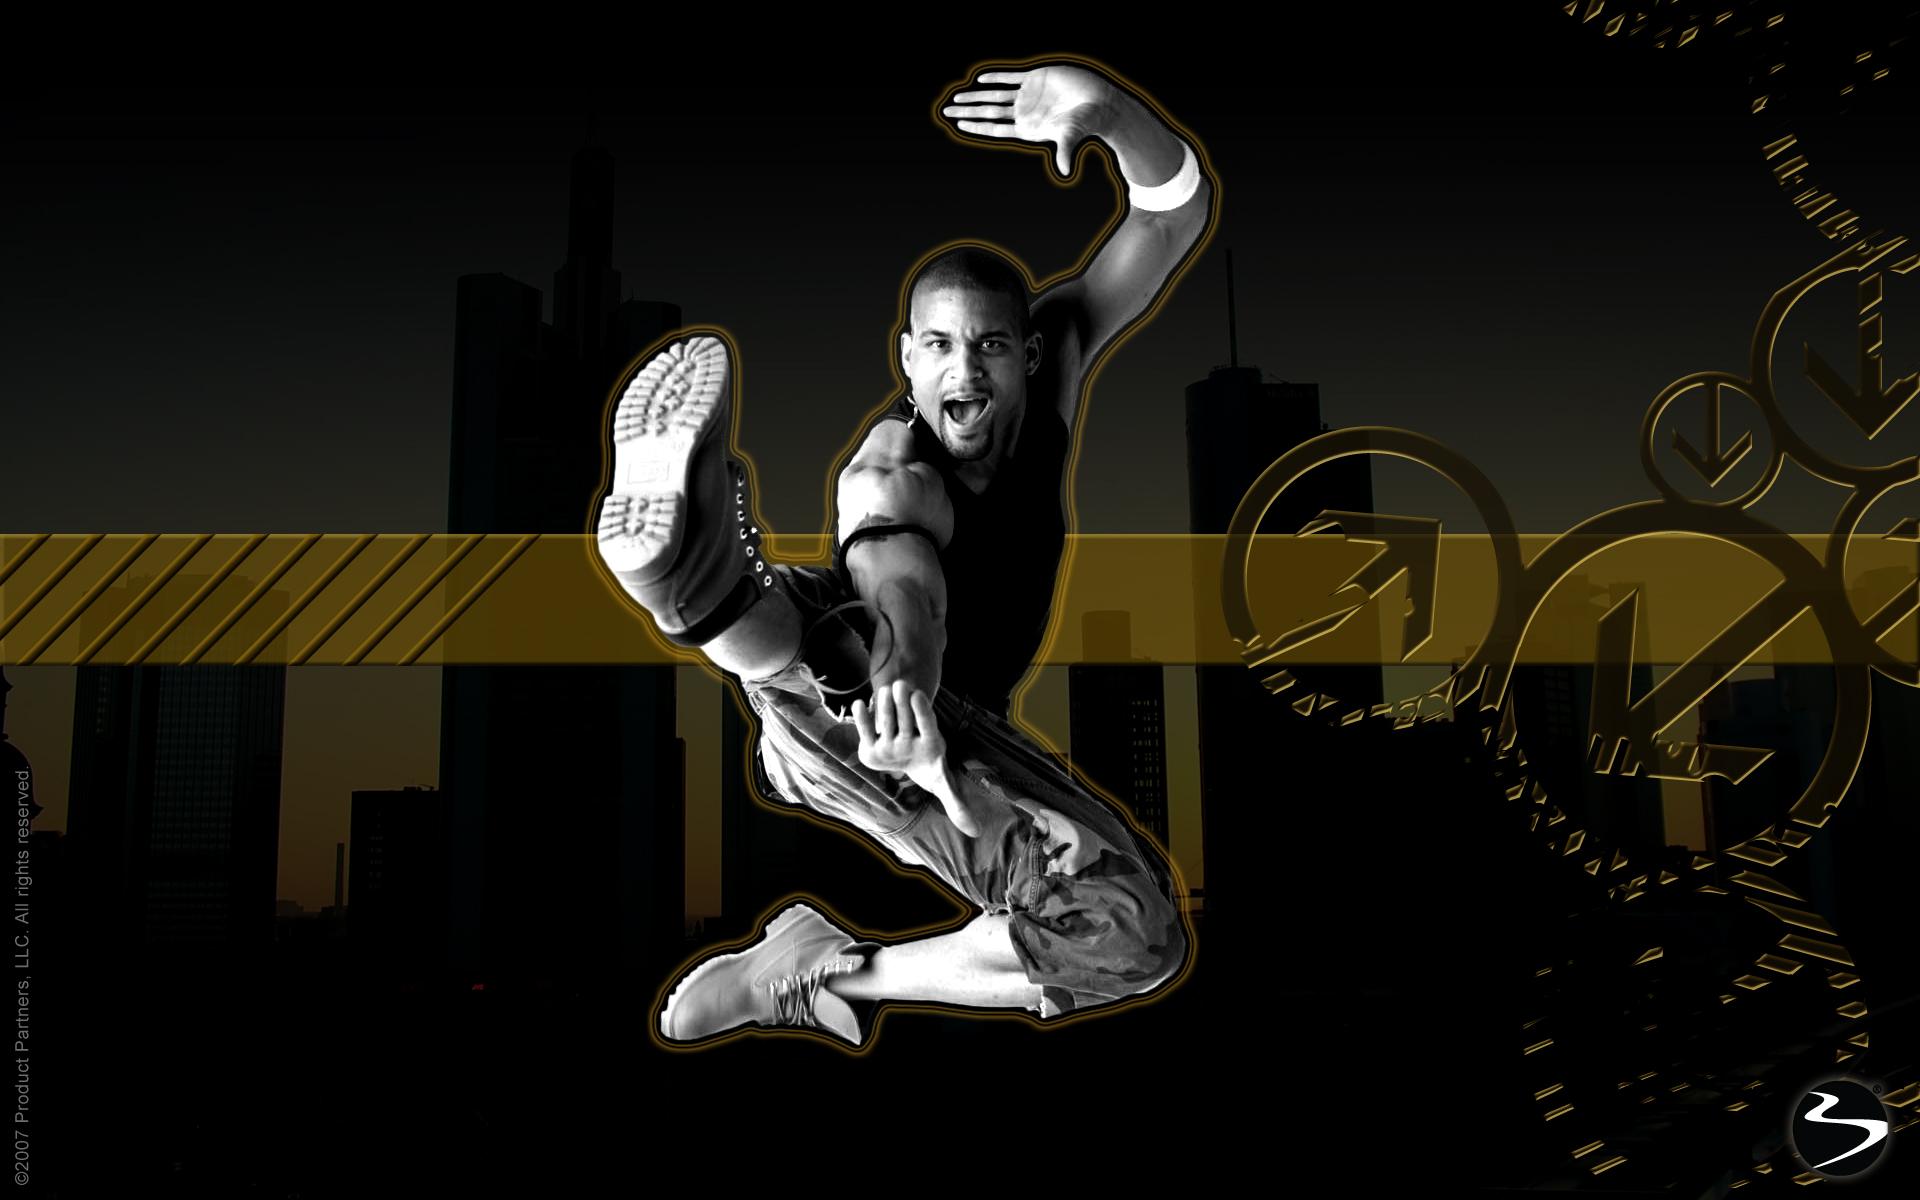 49] Submit Wallpaper P90X Exercise Program on WallpaperSafari 1920x1200